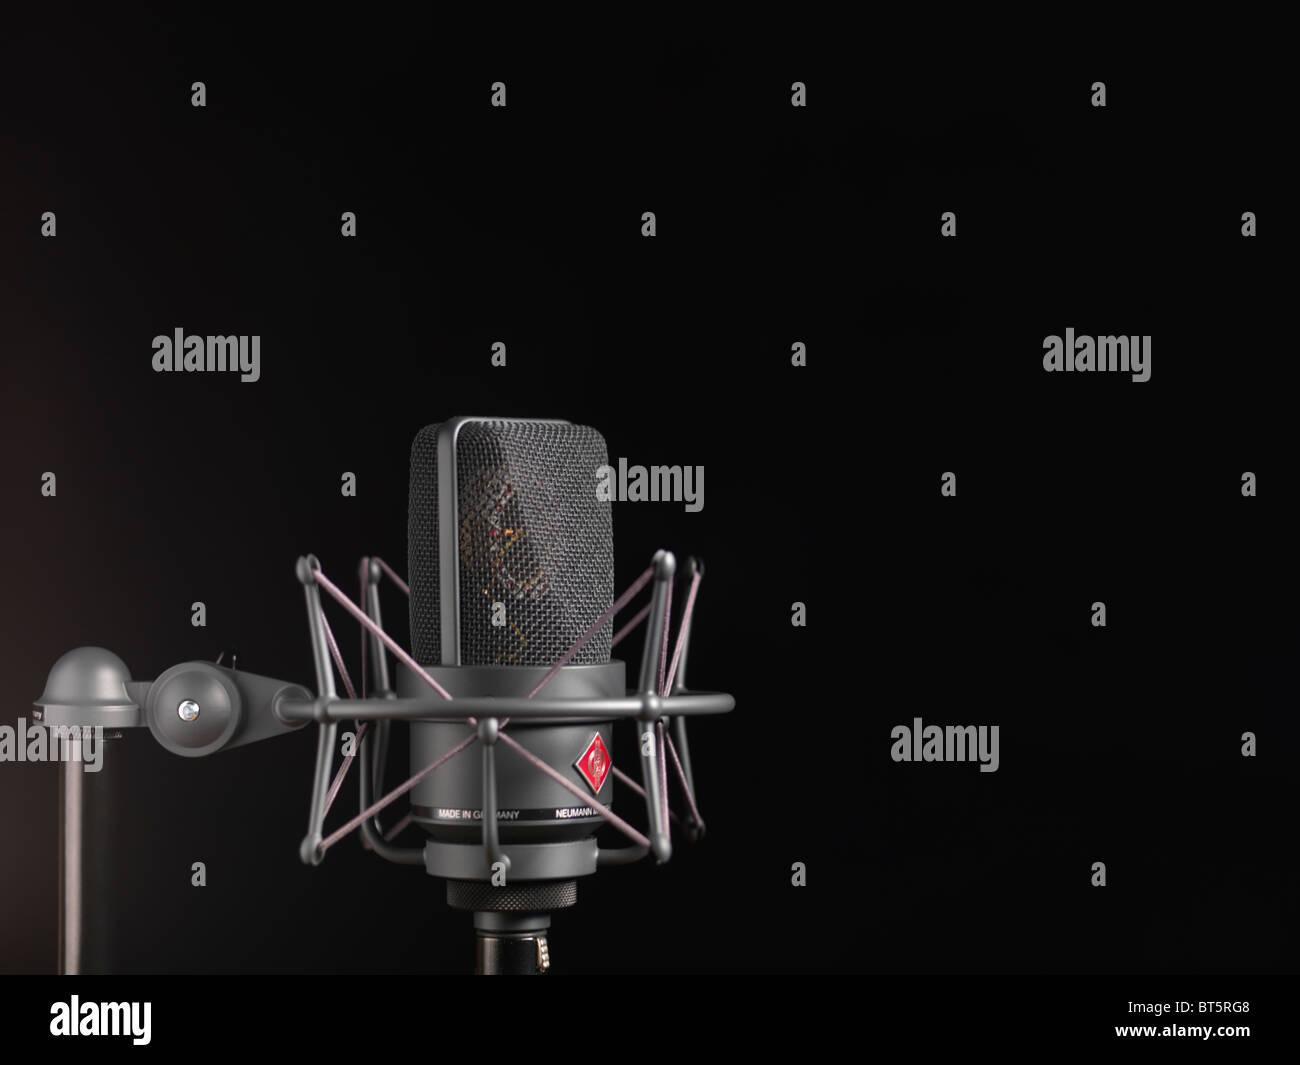 Neumann studio microphone TLM 103 - Stock Image